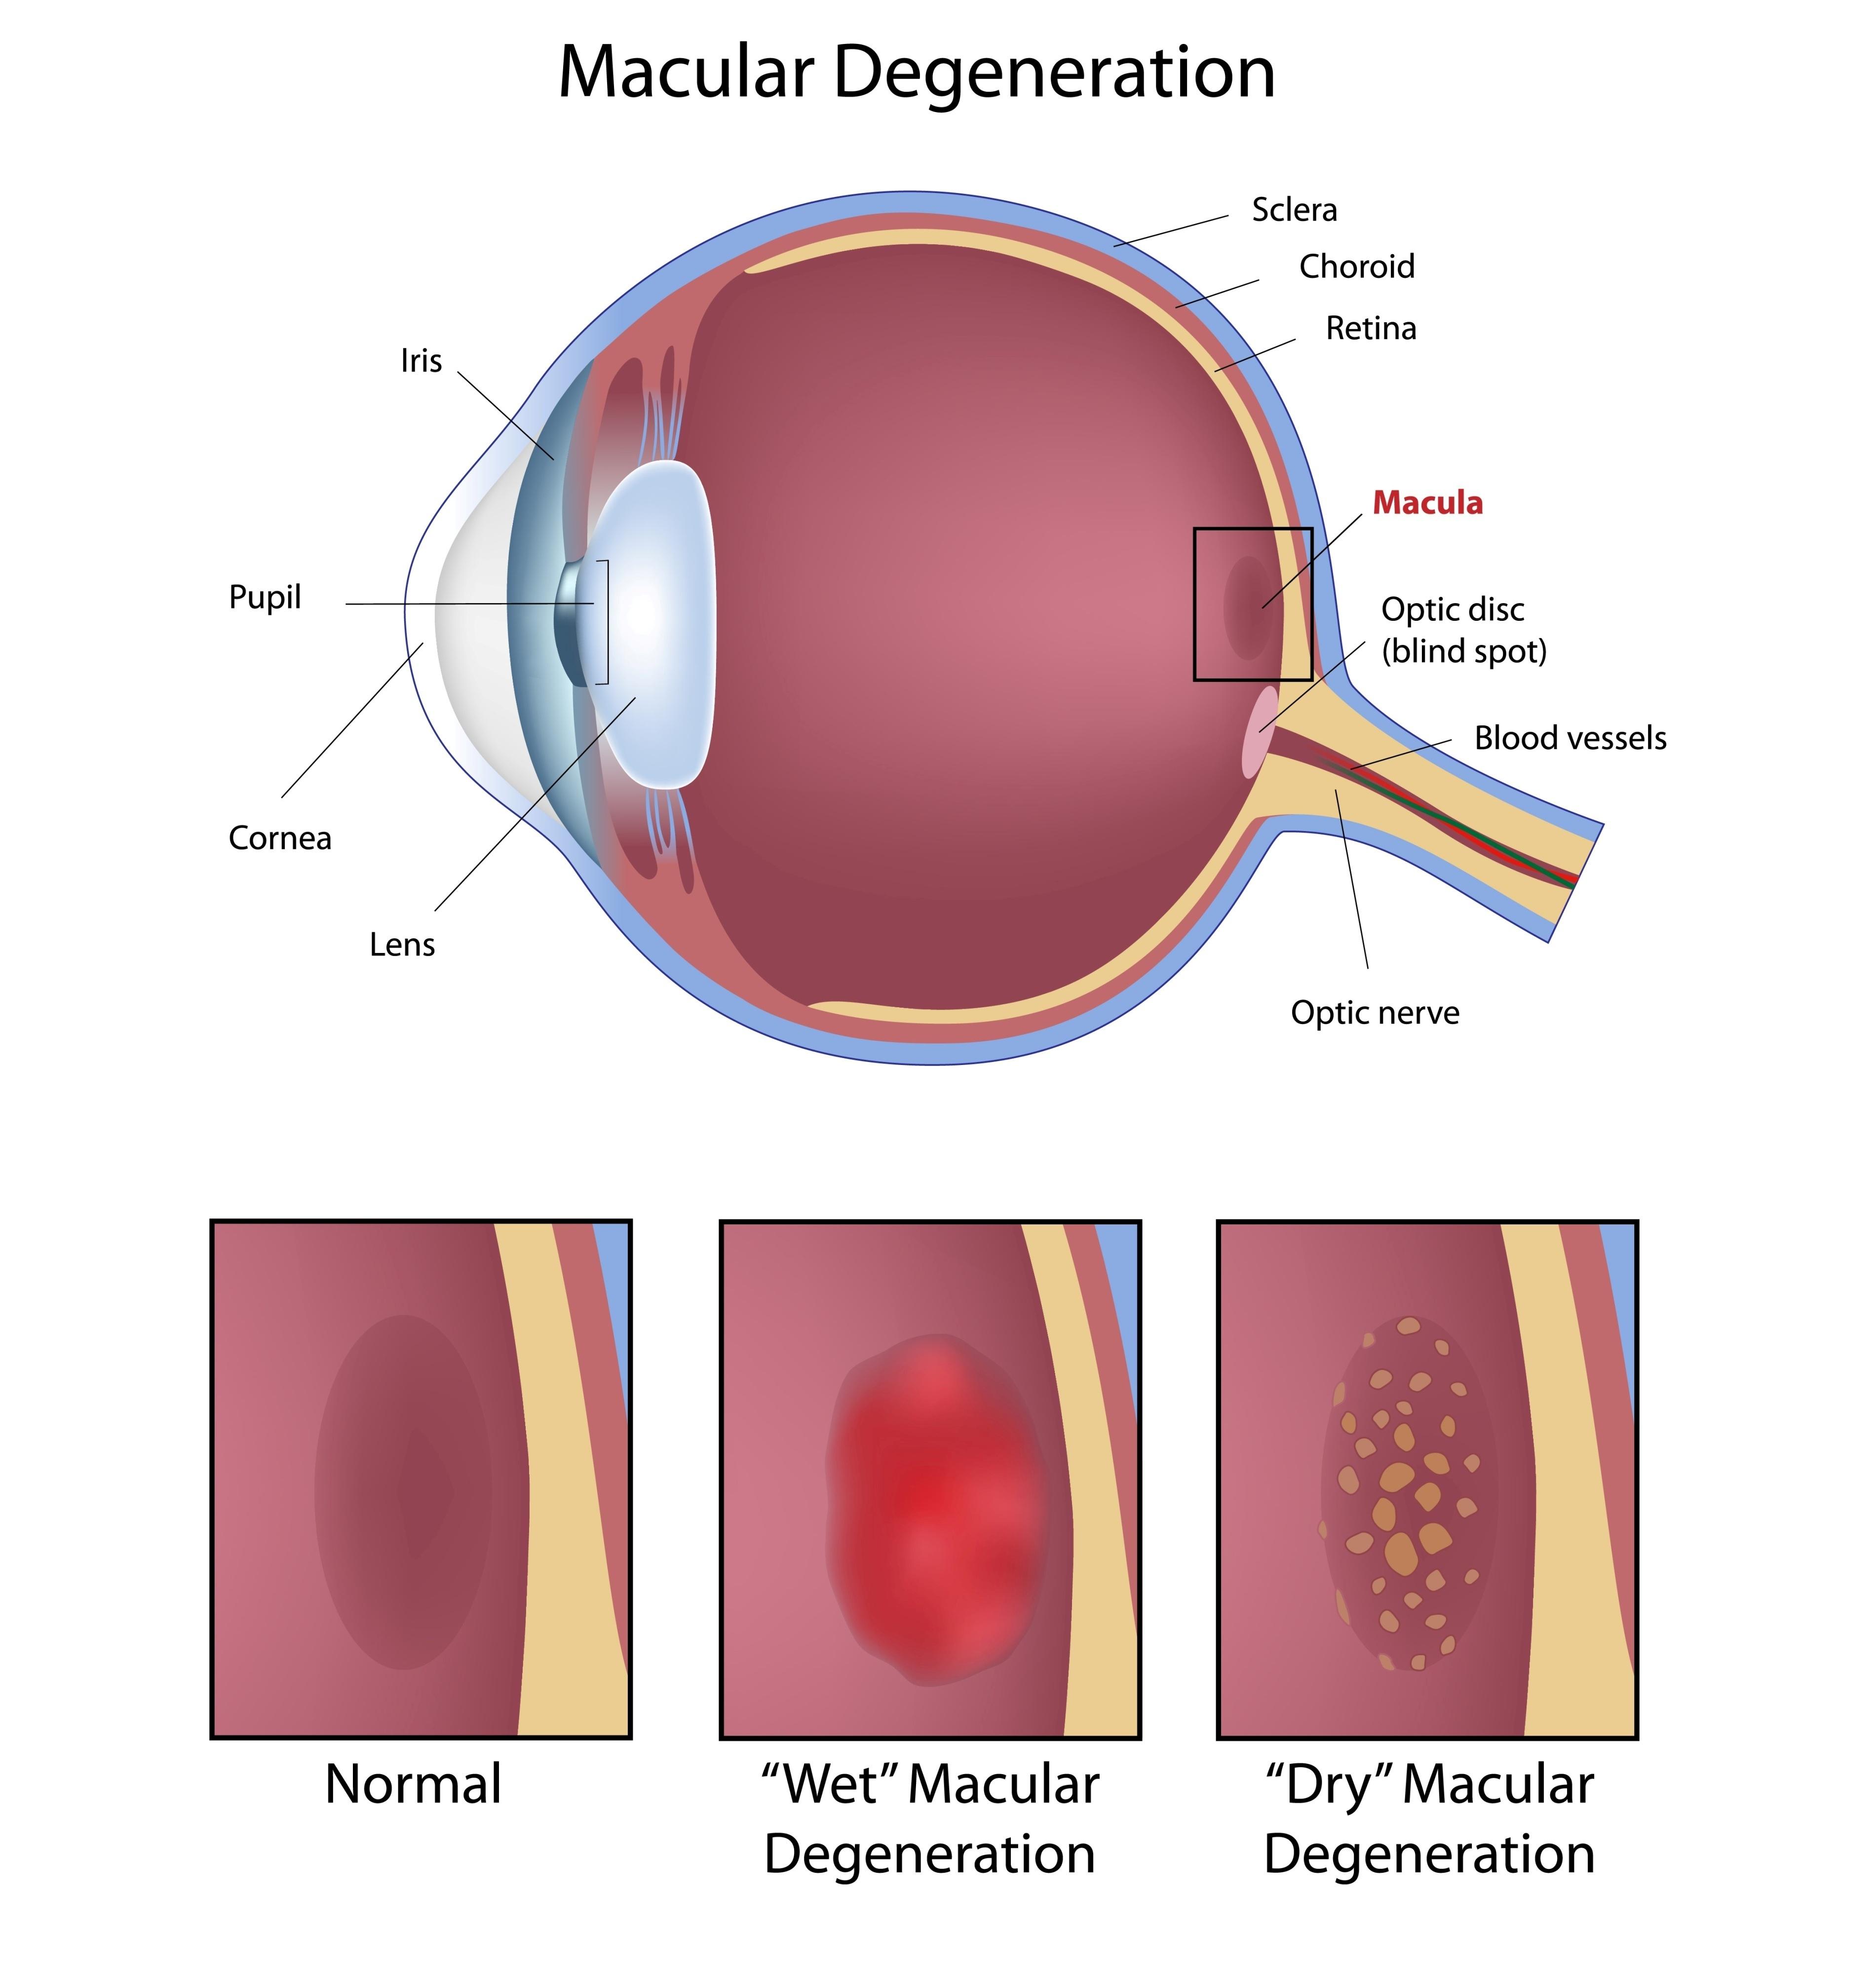 Doctor Leonard Achiron, Optometrist, Atlanta Macular Degeneration